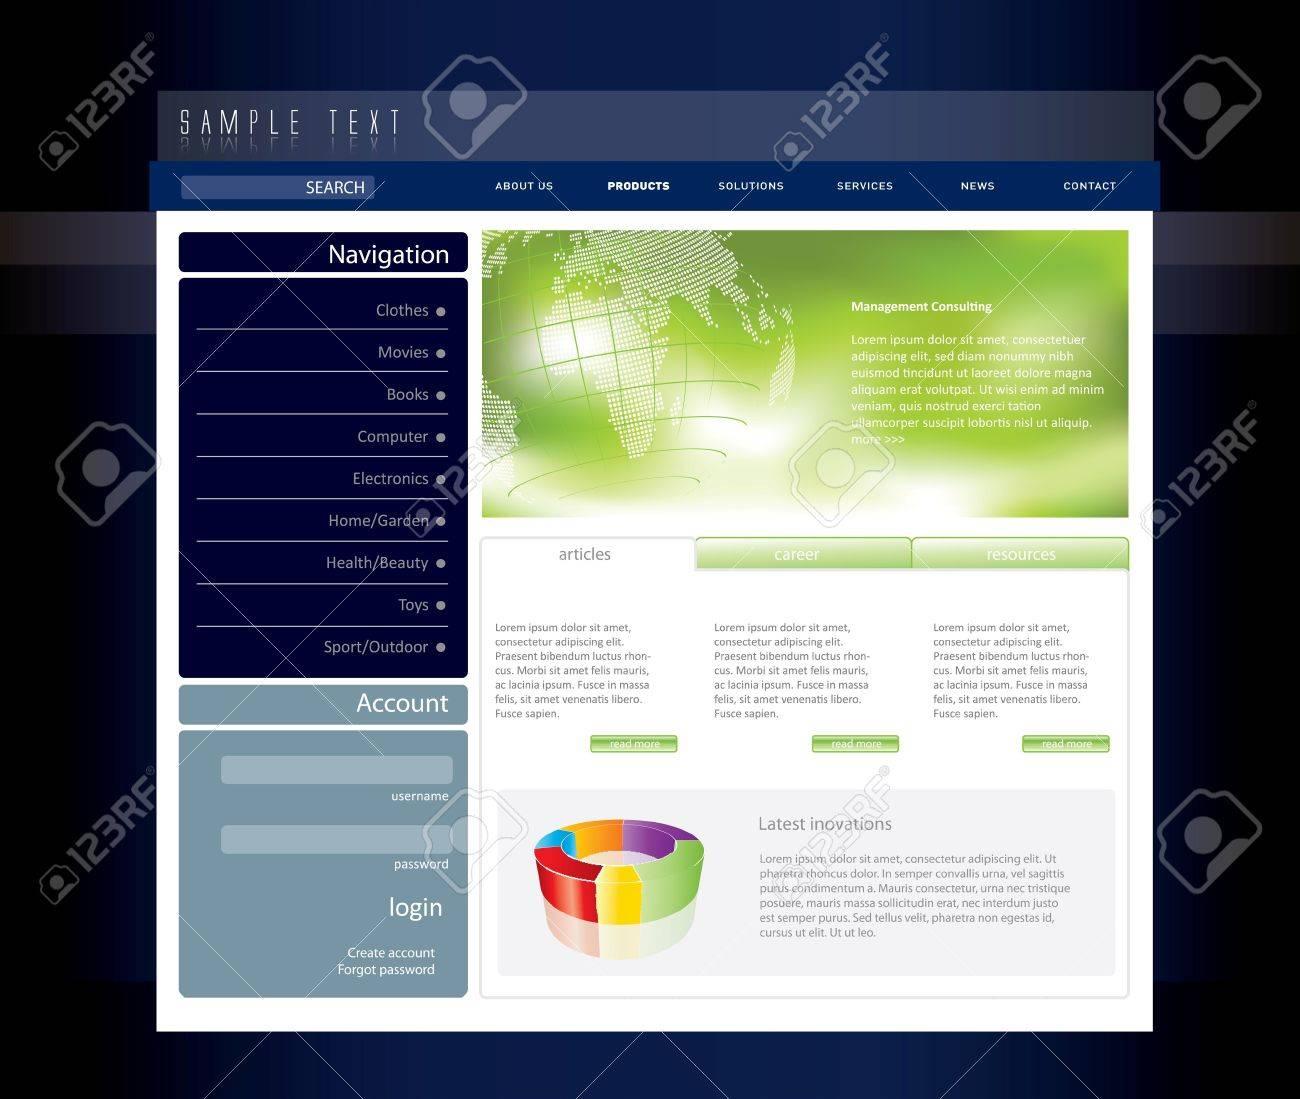 Business website template in editable  format Stock Vector - 7920634